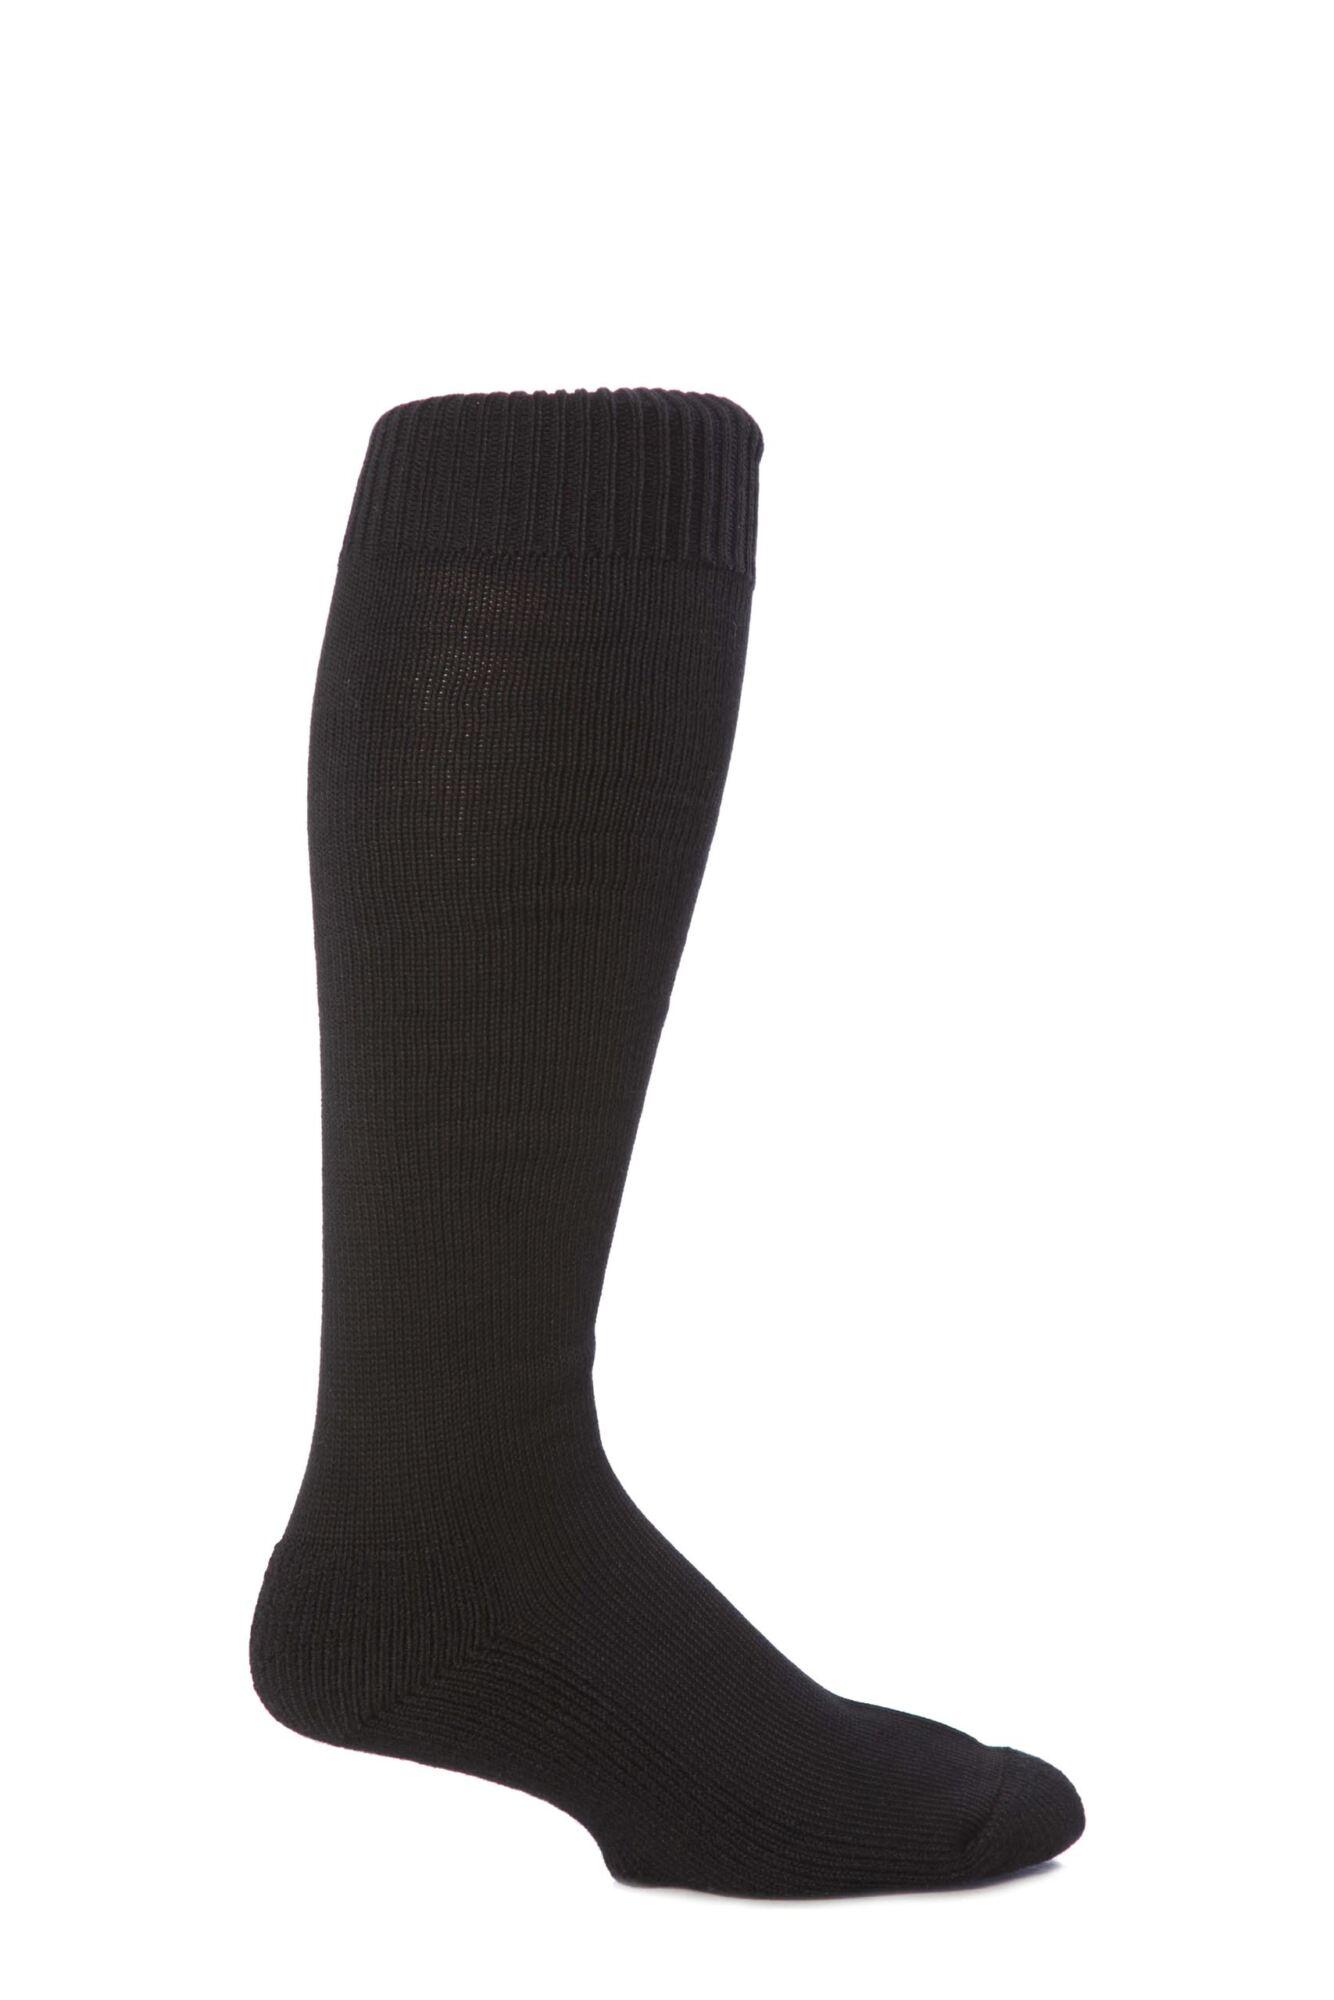 1 Pair of London Cotton Riding Socks With Cushion Sole Unisex - SOCKSHOP of London